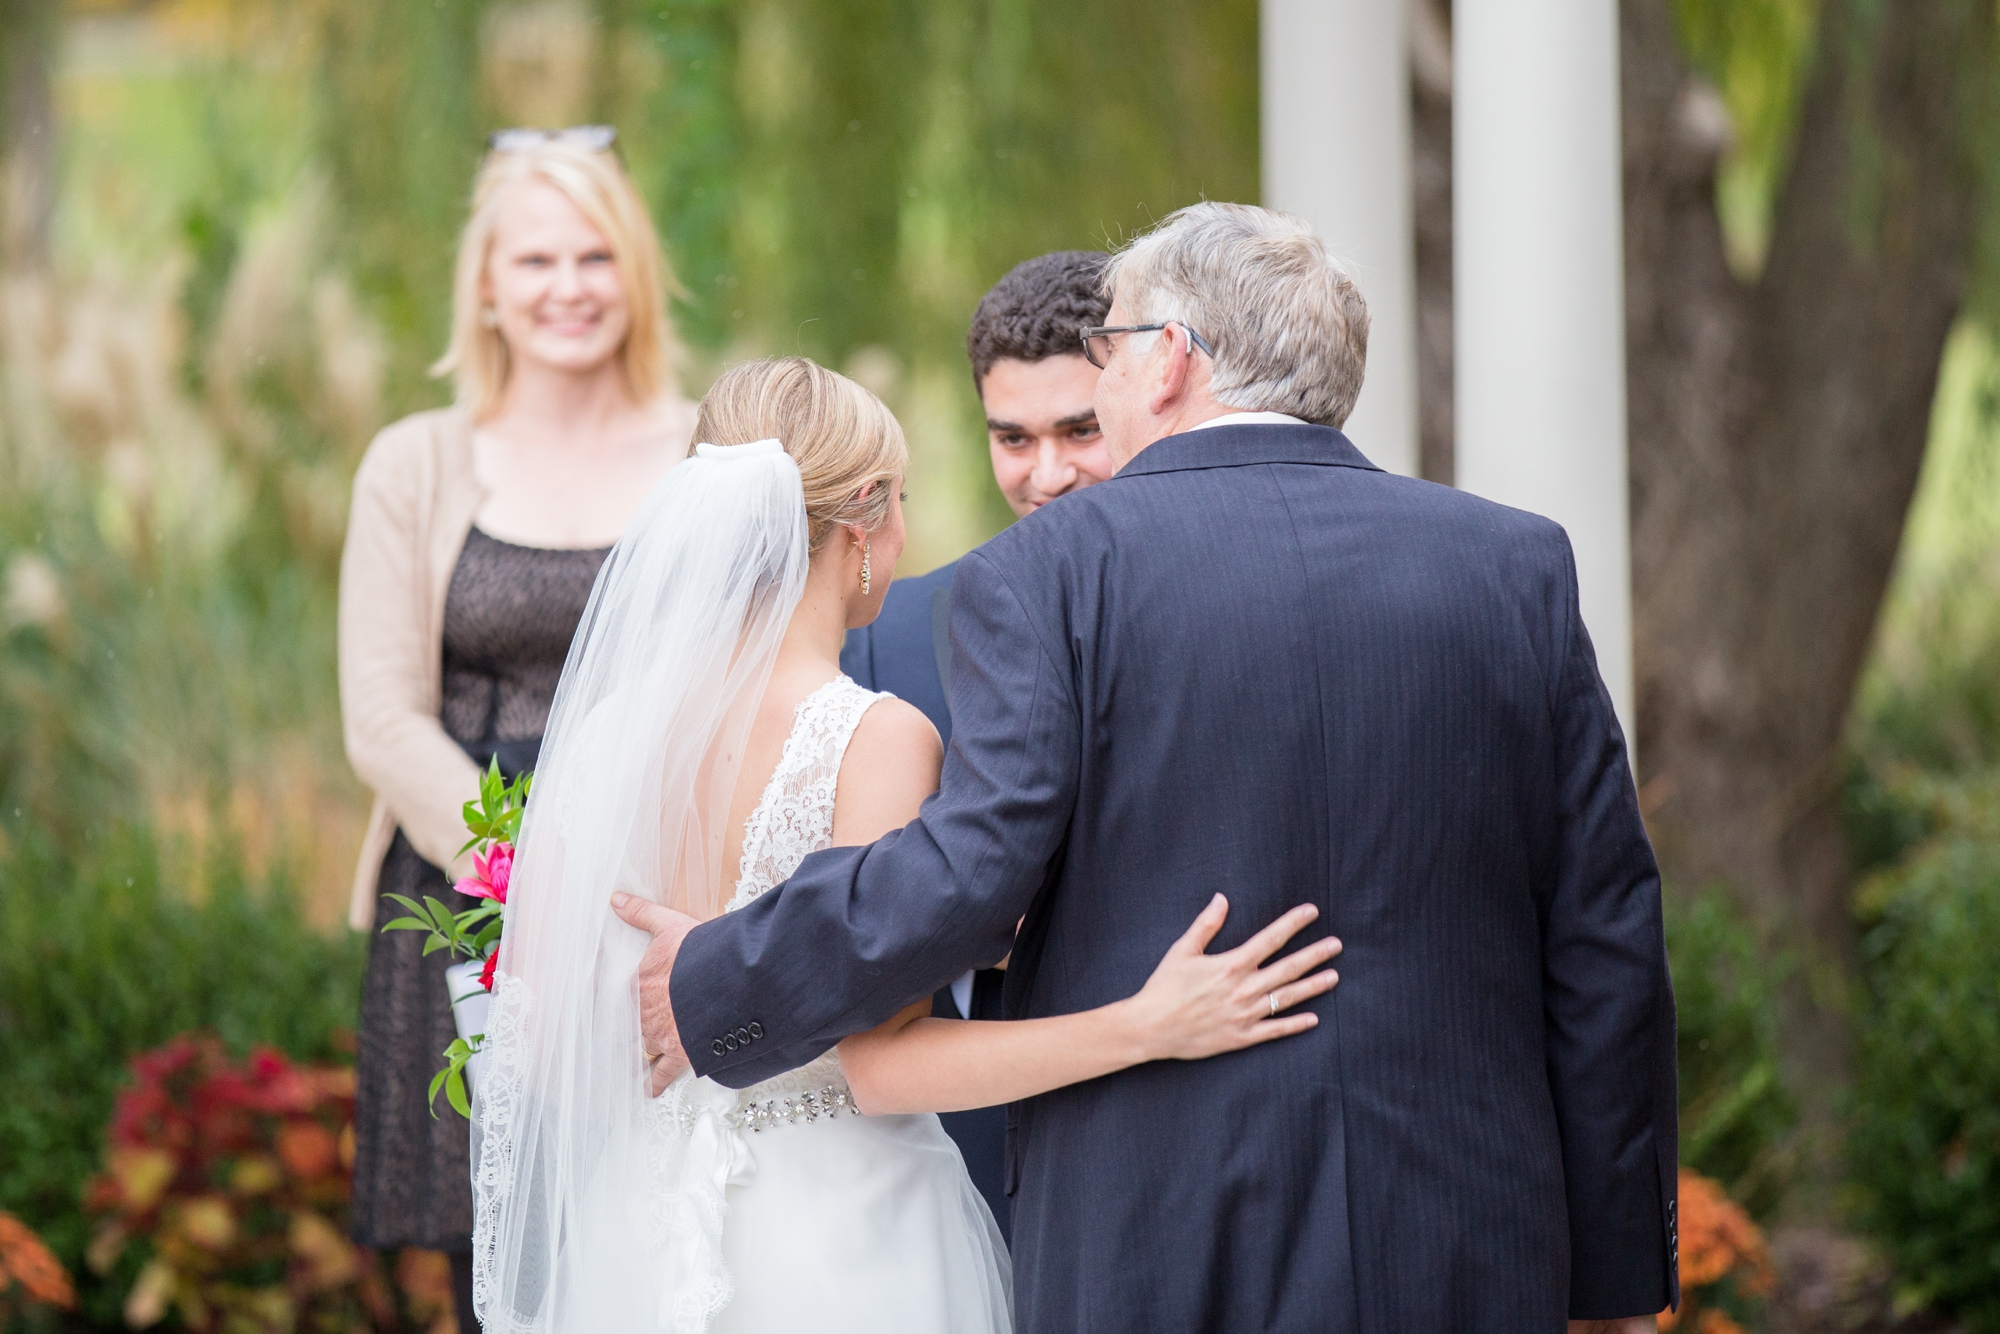 5-Finkel Wedding Ceremony-622_anna grace photography maryland wedding photographer turf valley.jpg